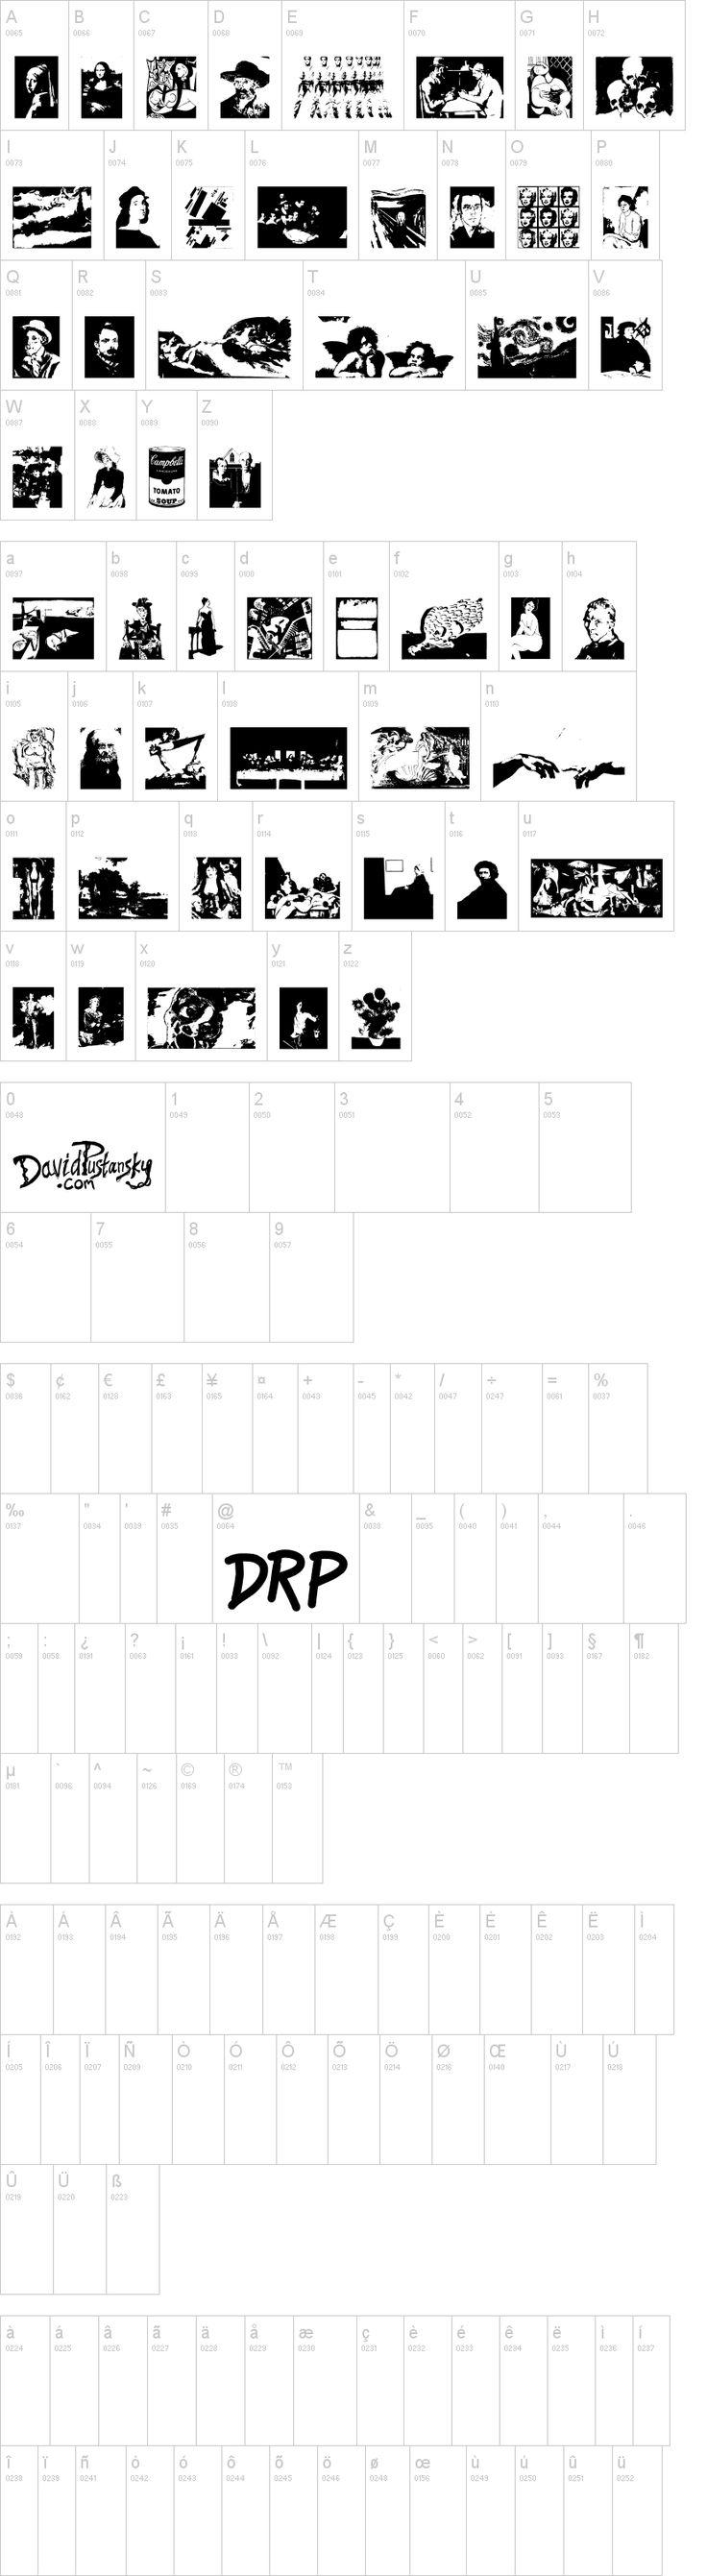 A Work Of Art free font - great font for crafts, journals, sketchbooks, etc.